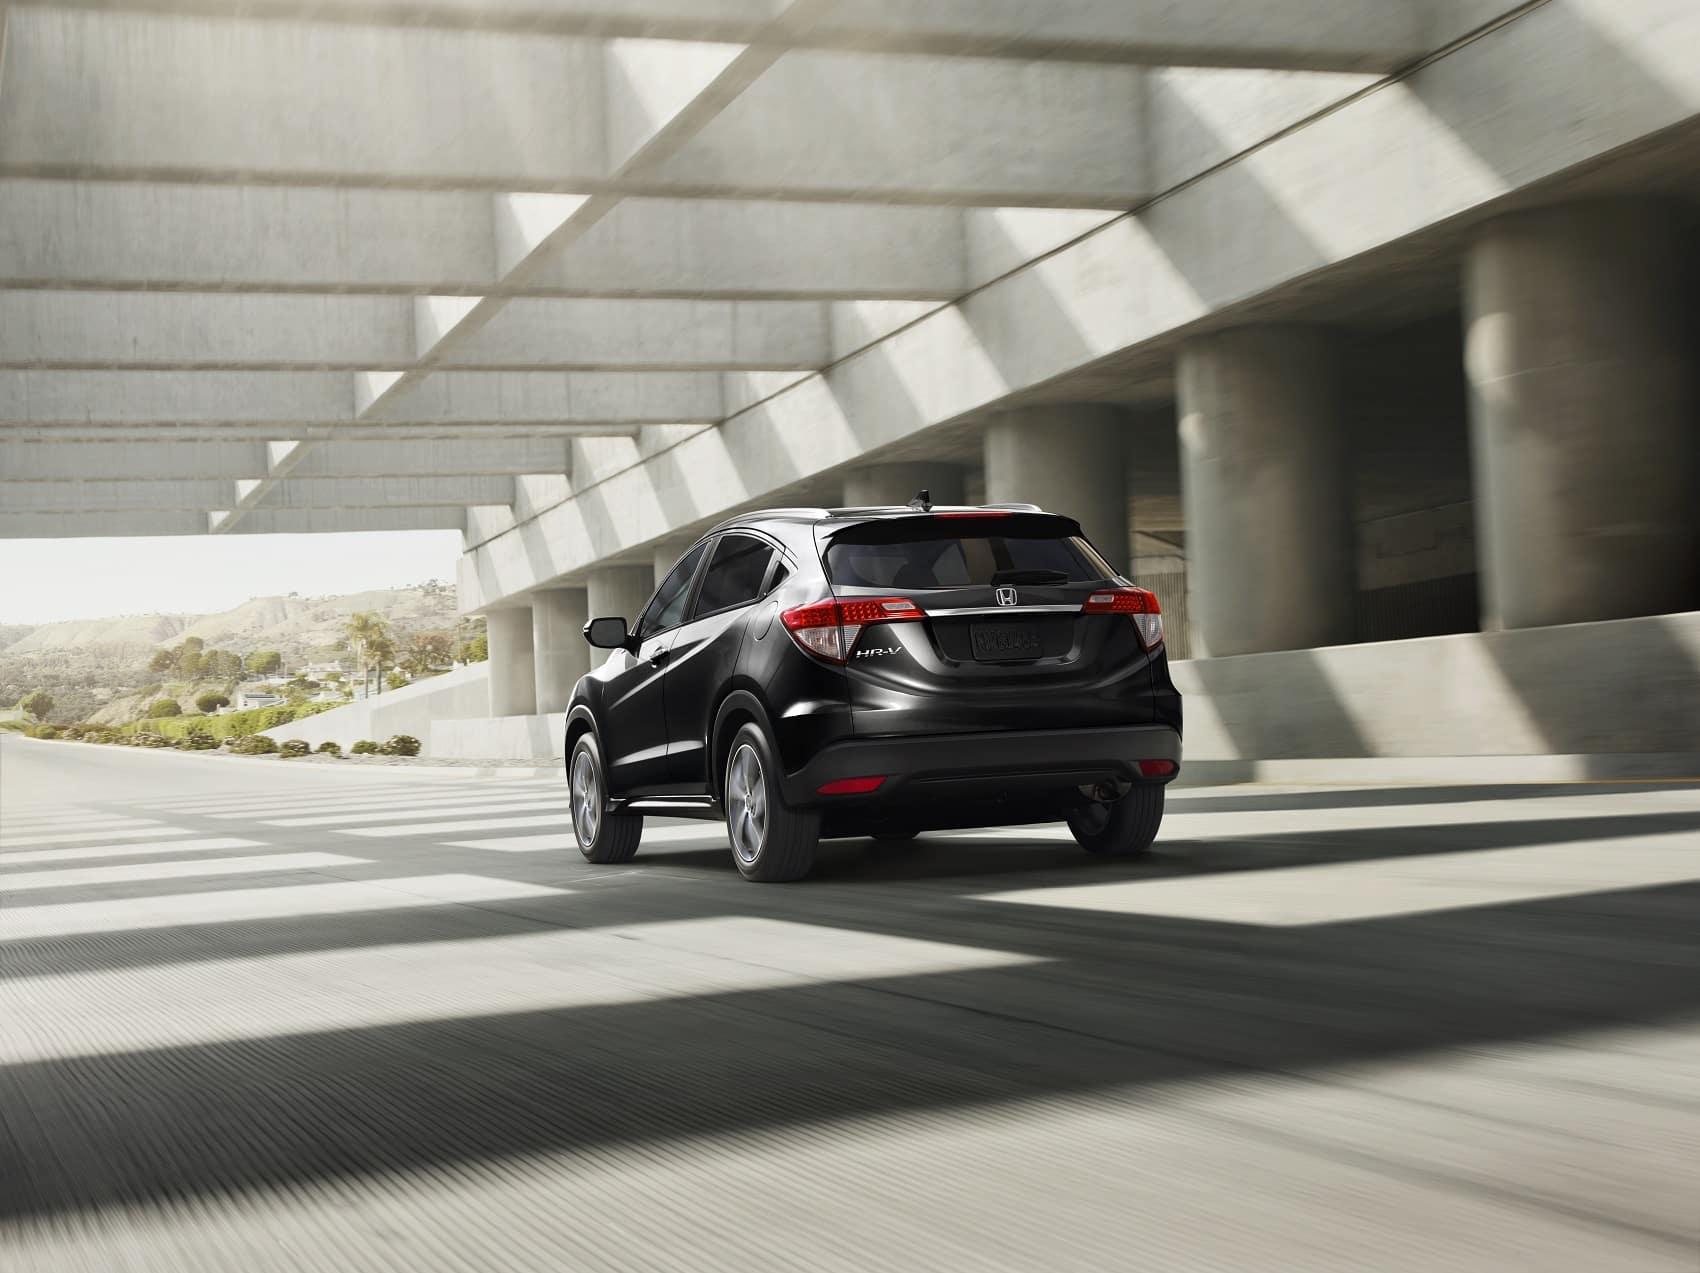 Honda HR-V Trim Levels